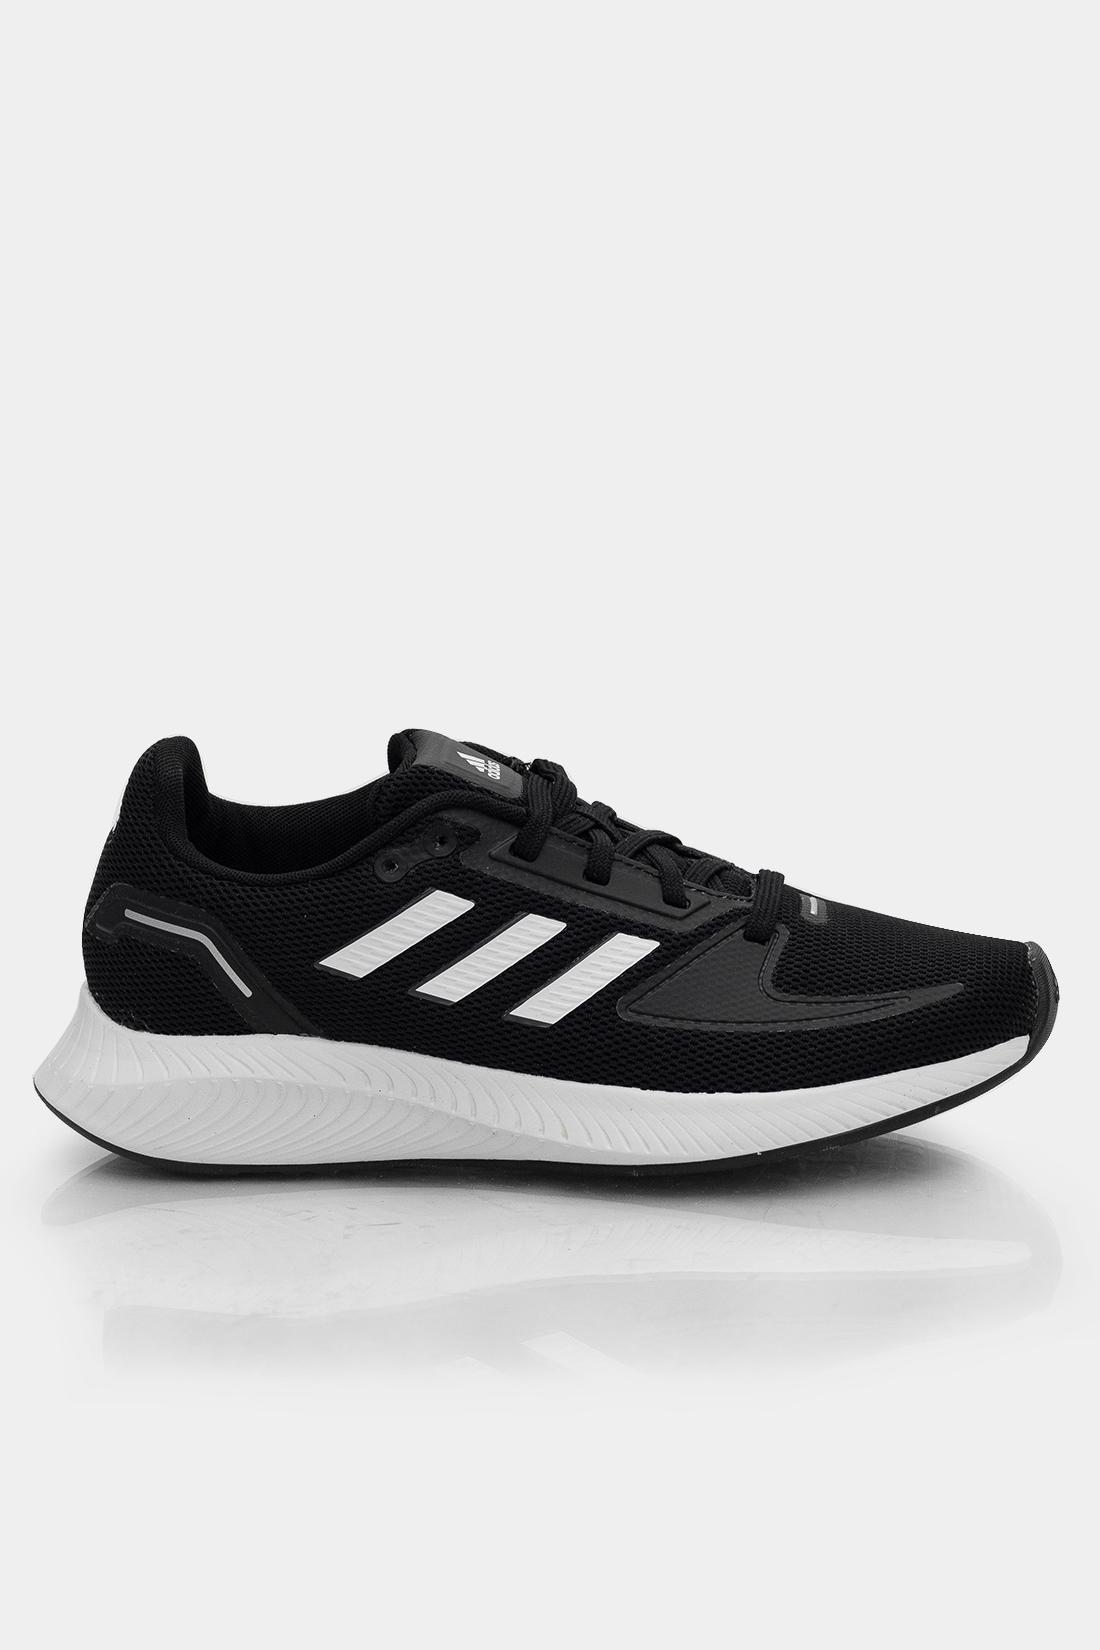 Tenis Running Adidas Runfalcon 2.0